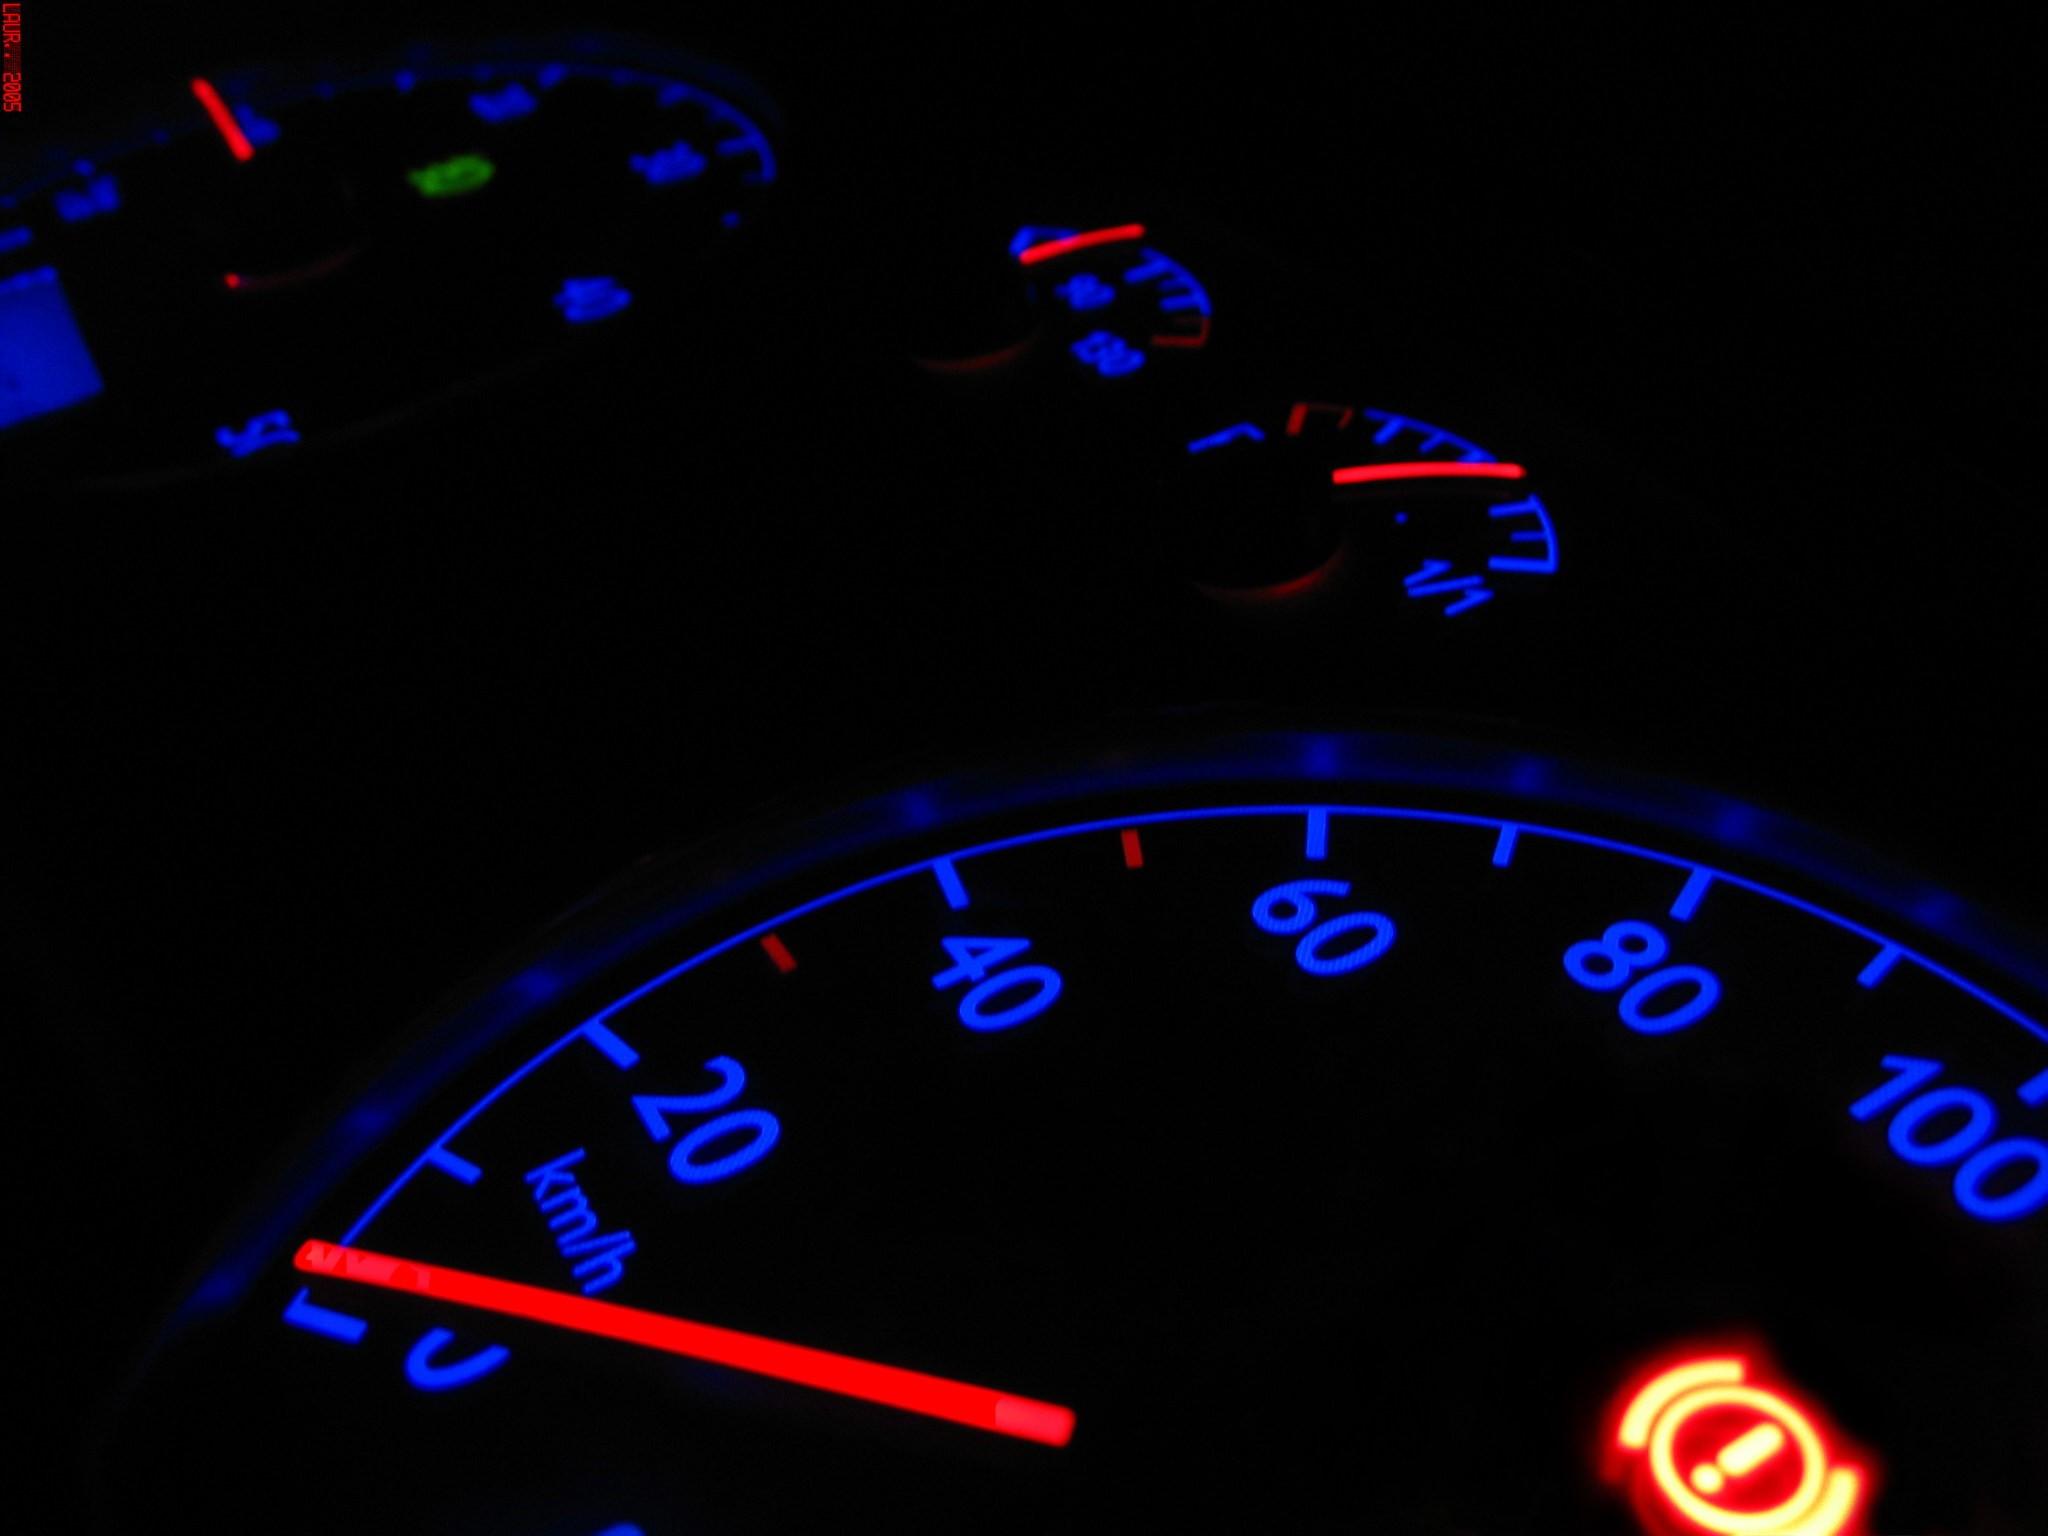 спидометр speedometer  № 2611060 загрузить